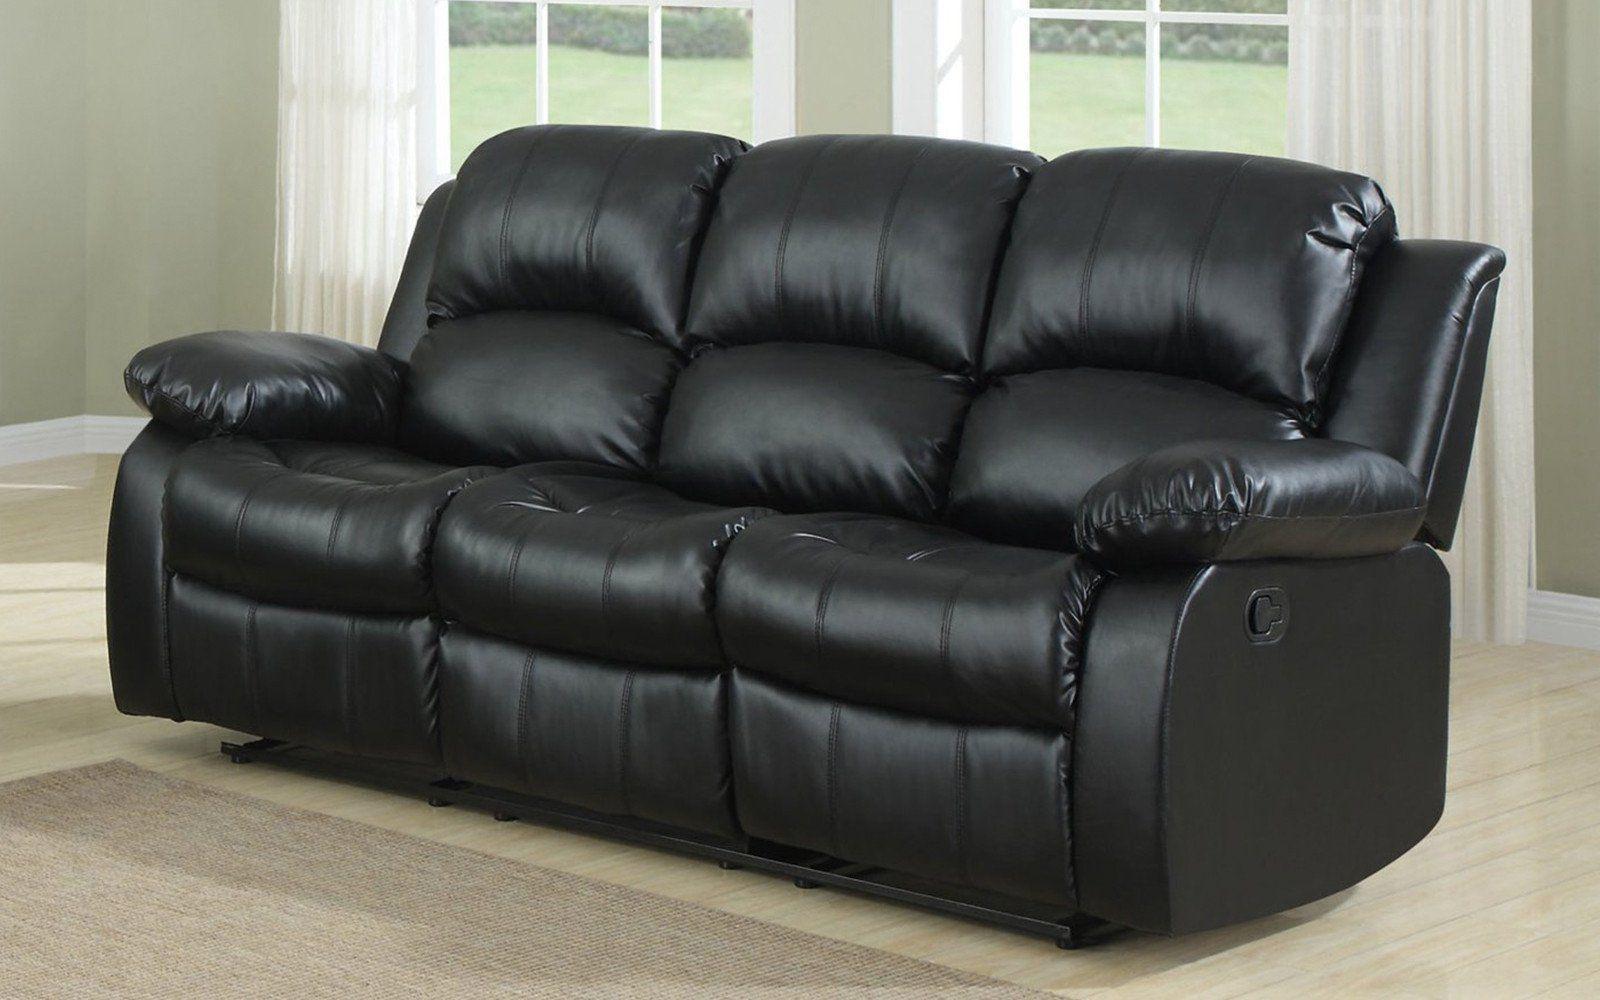 Bob Classic Bonded Leather Recliner Sofa Recliningsofa Reclining Sofa Leather Recliner